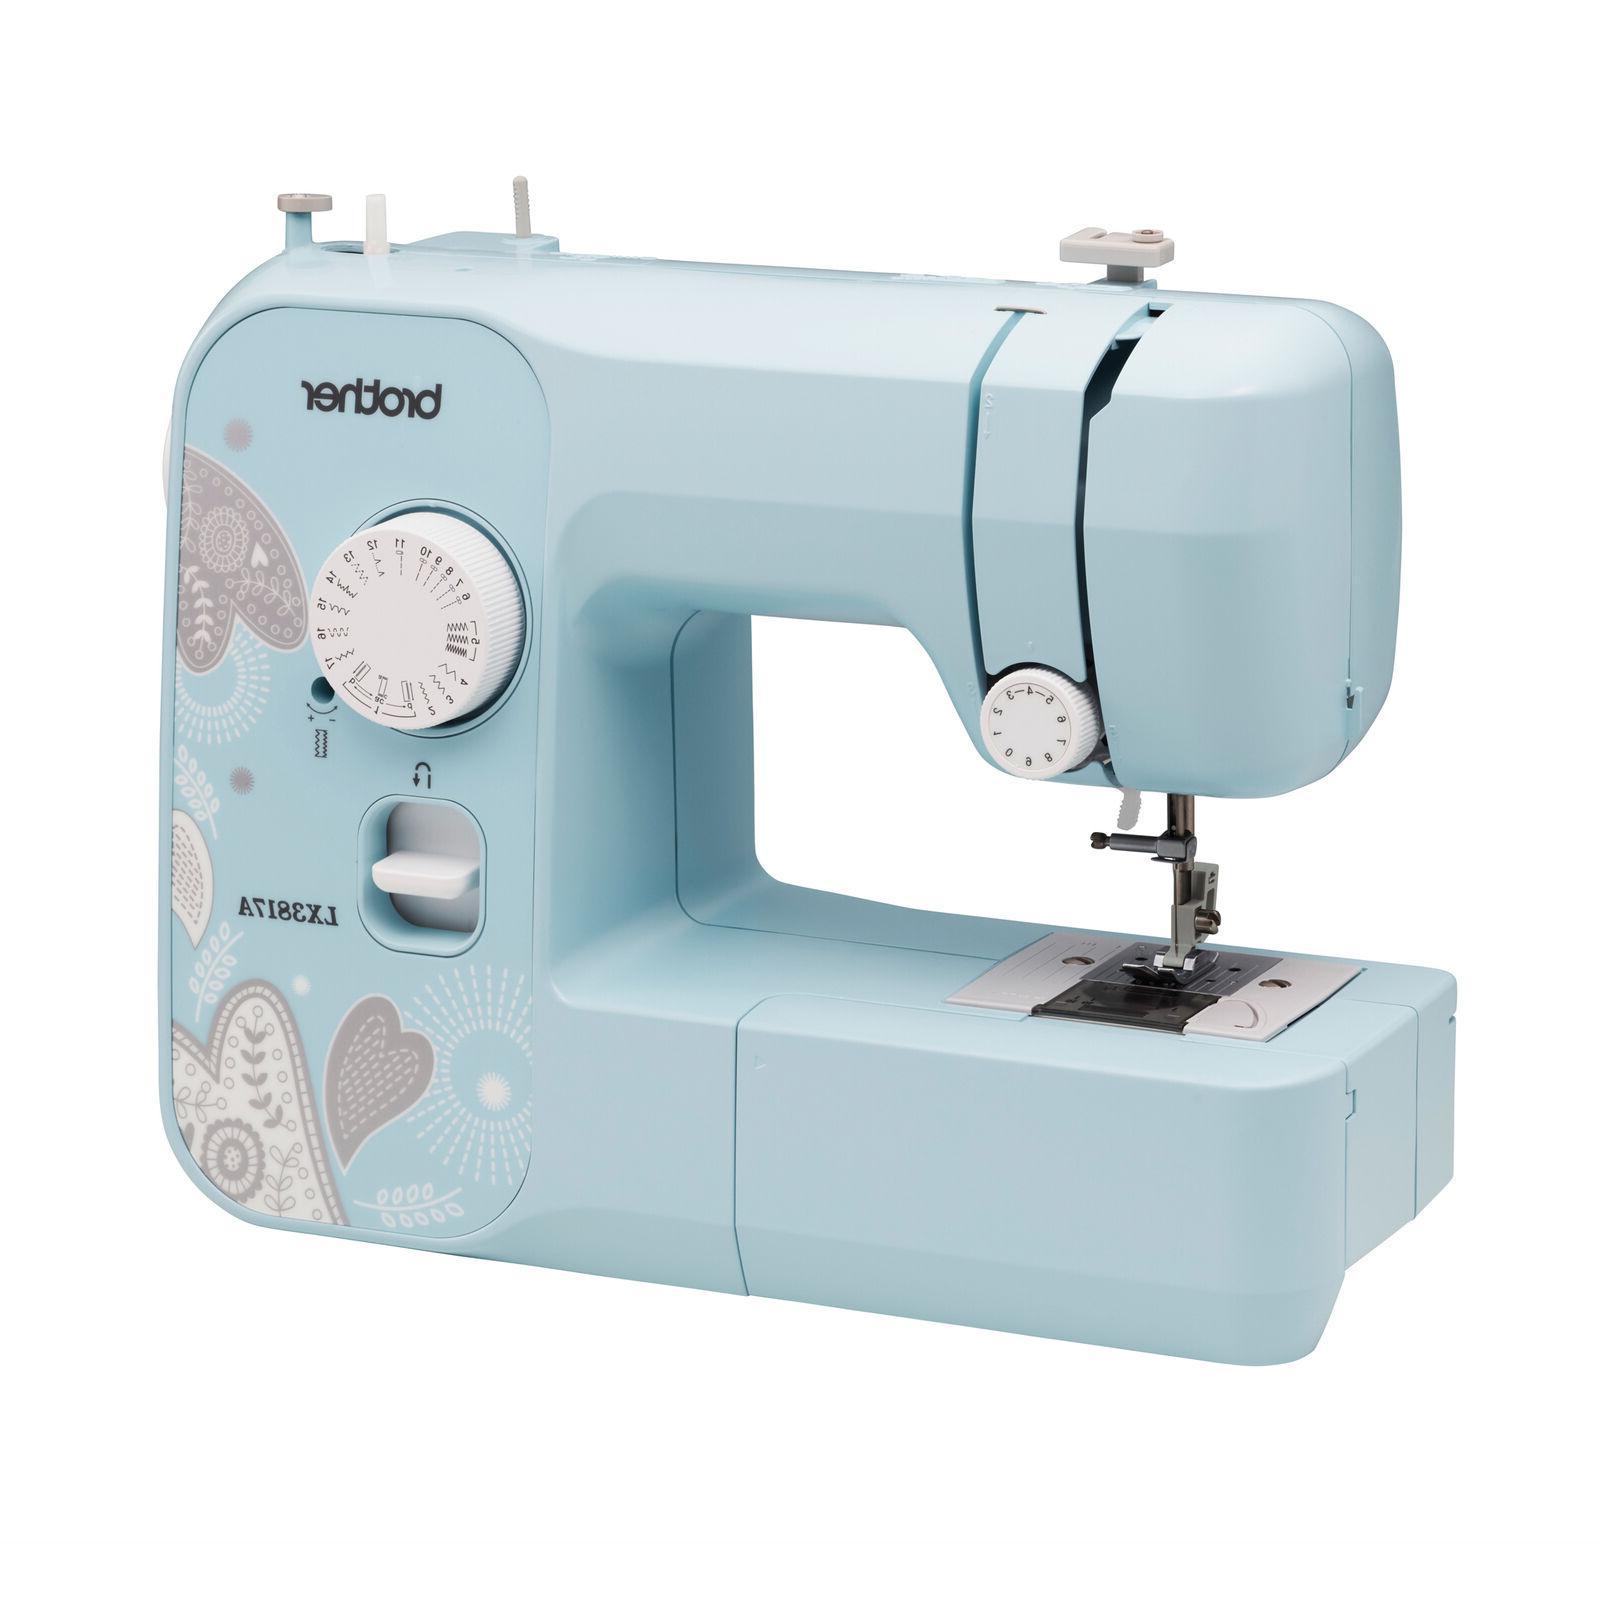 Full-Size Aqua Sewing Machine 17 Built-in Sewing Stitches wi